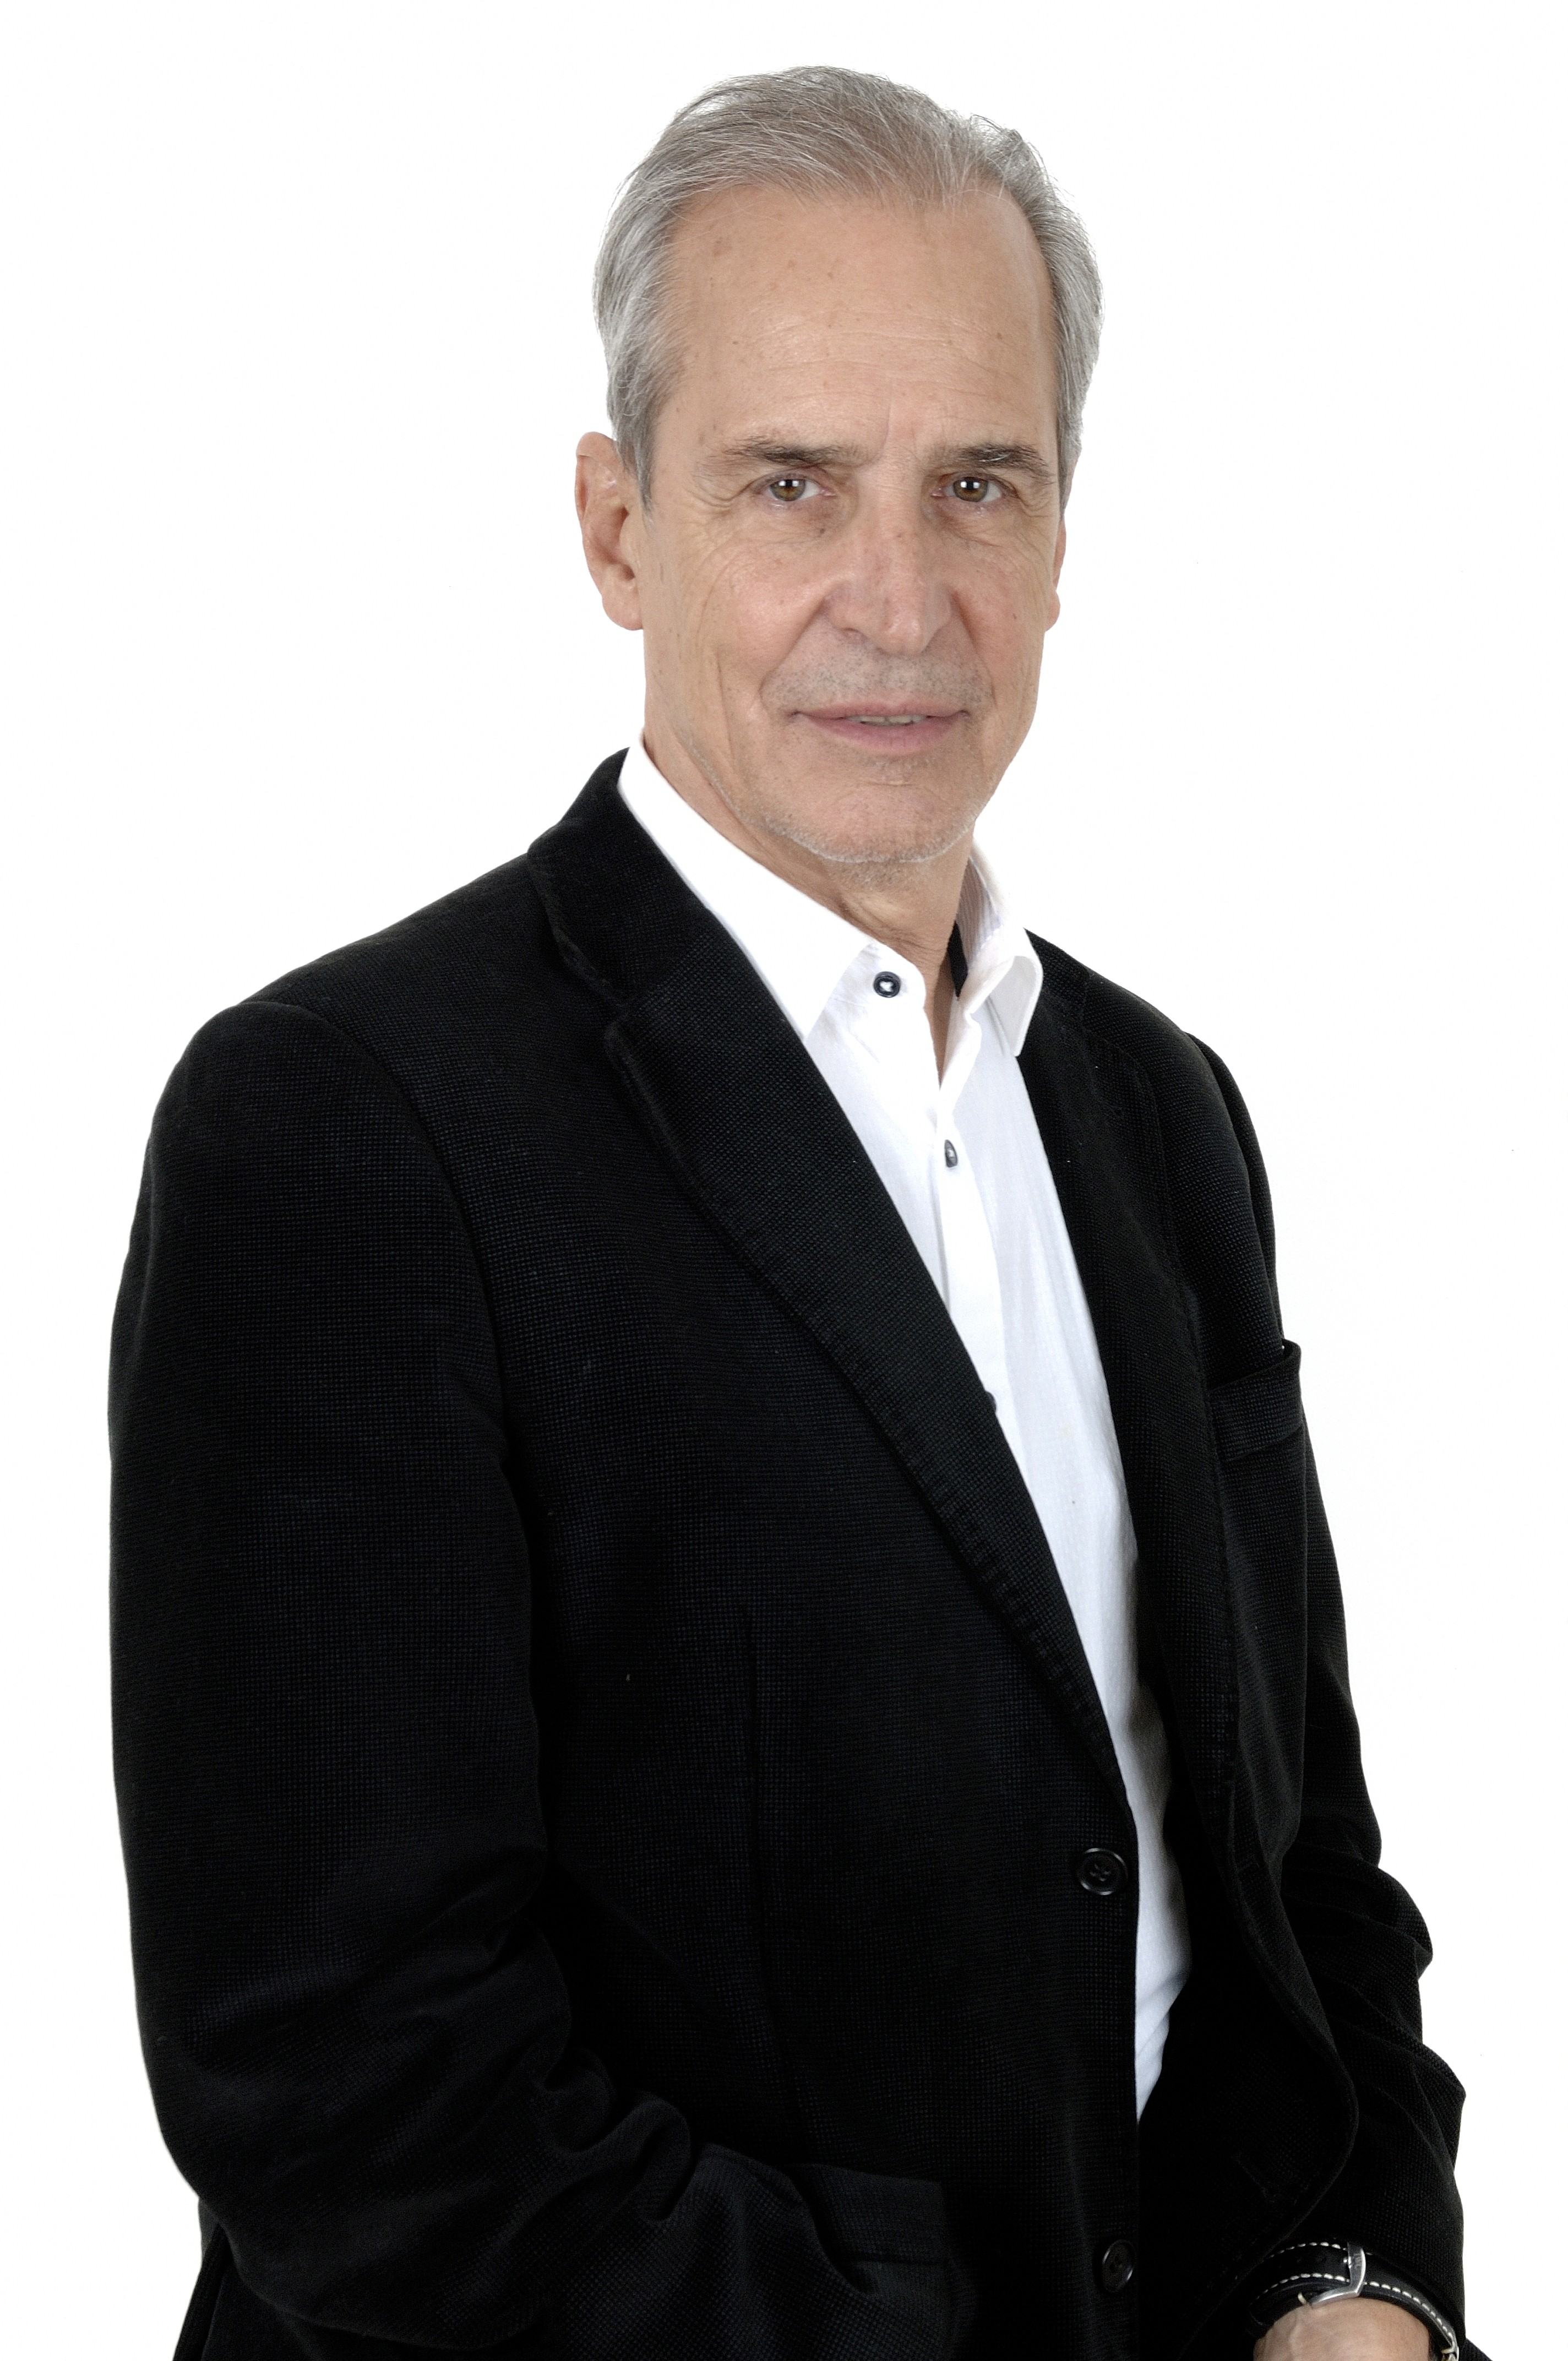 Jorge Calatayud